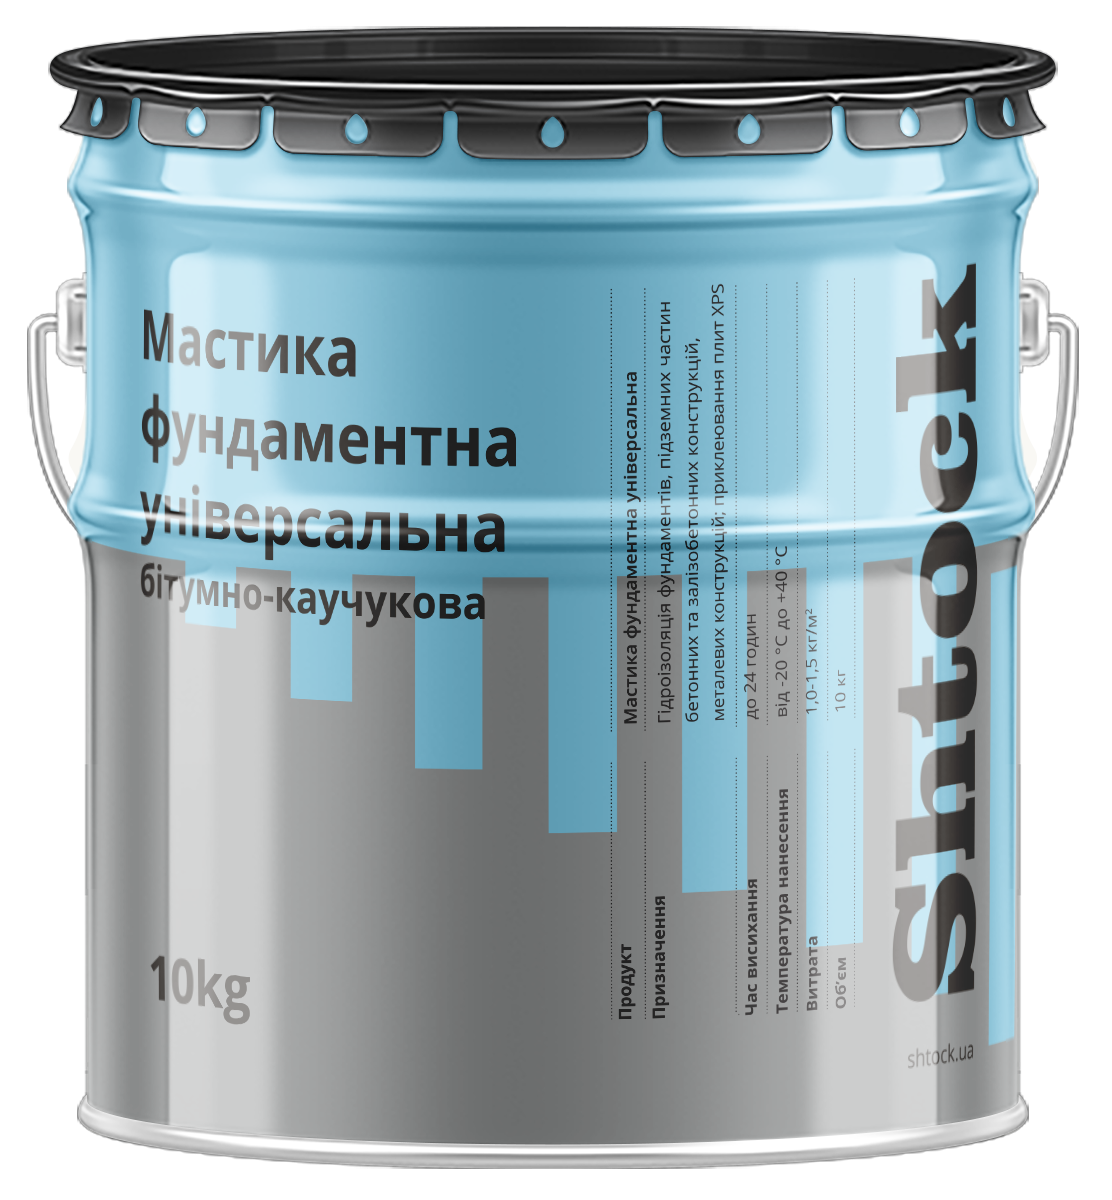 Мастика бітумно-каучукова фундаментна, 10 кг